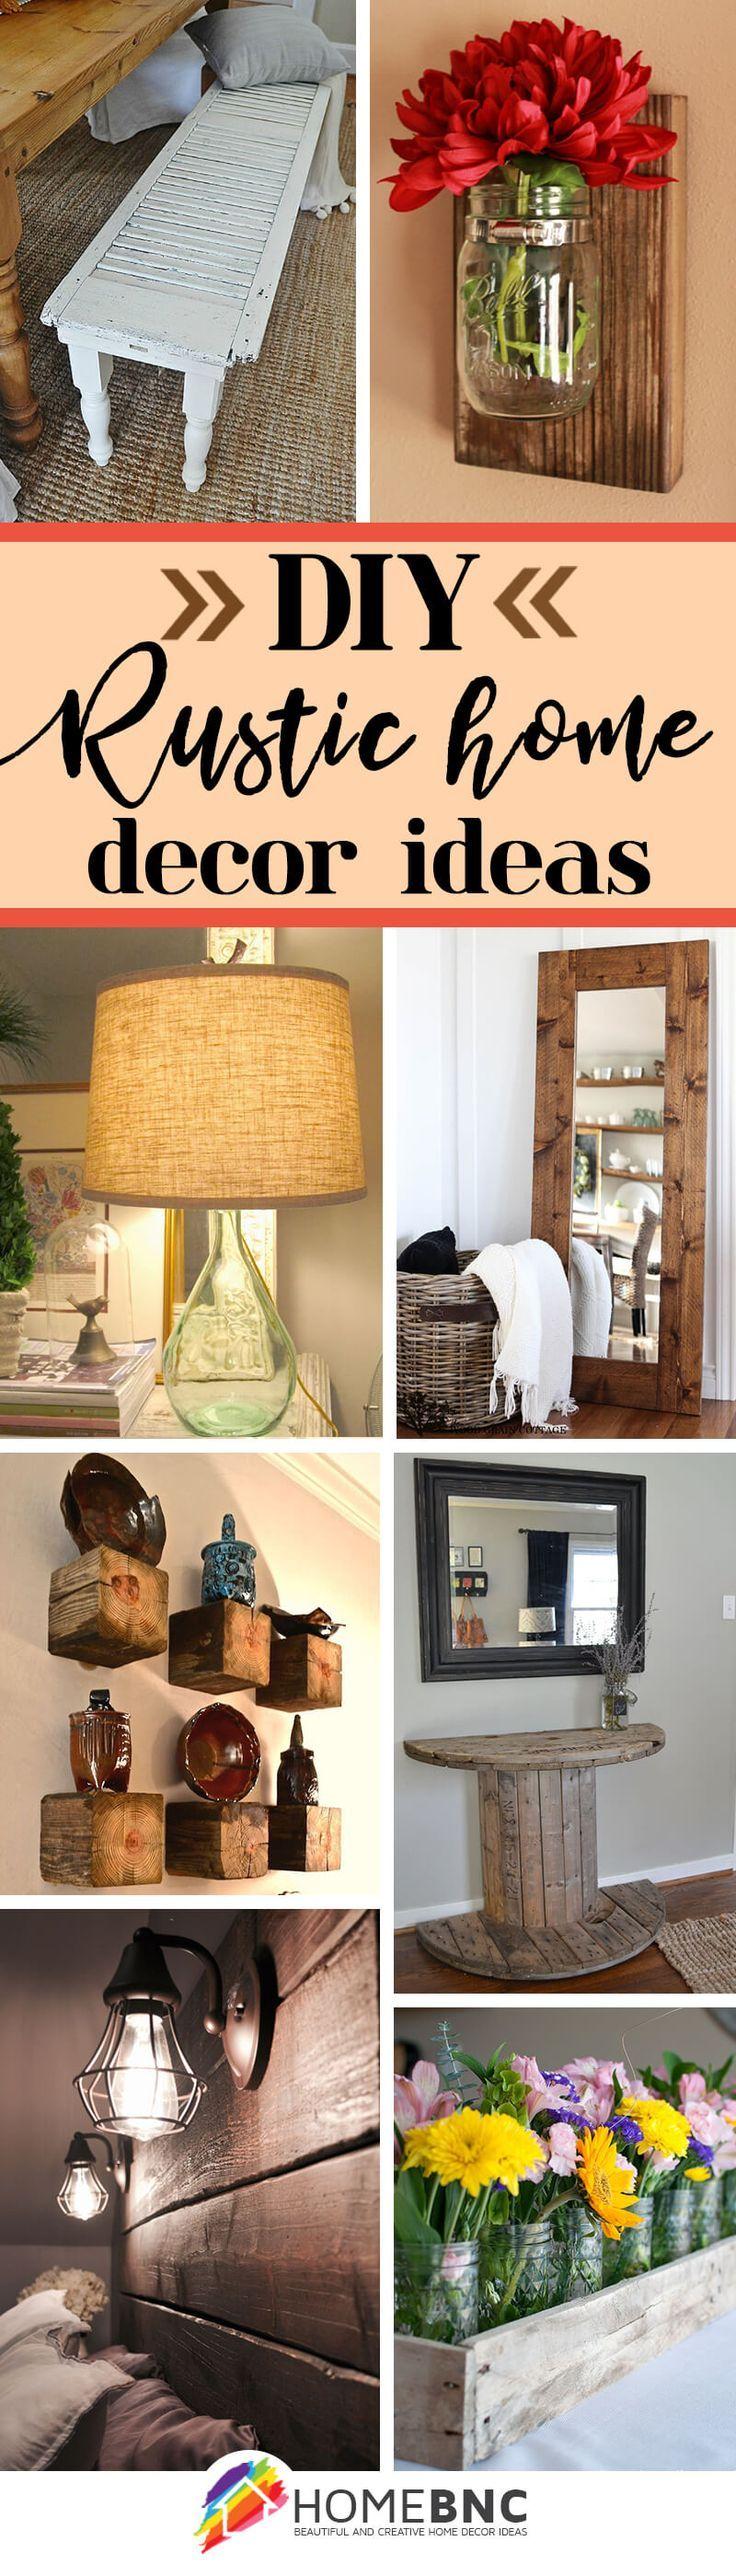 39 diy rustic home decor ideas you can make yourself for Ideas decoracion rustica